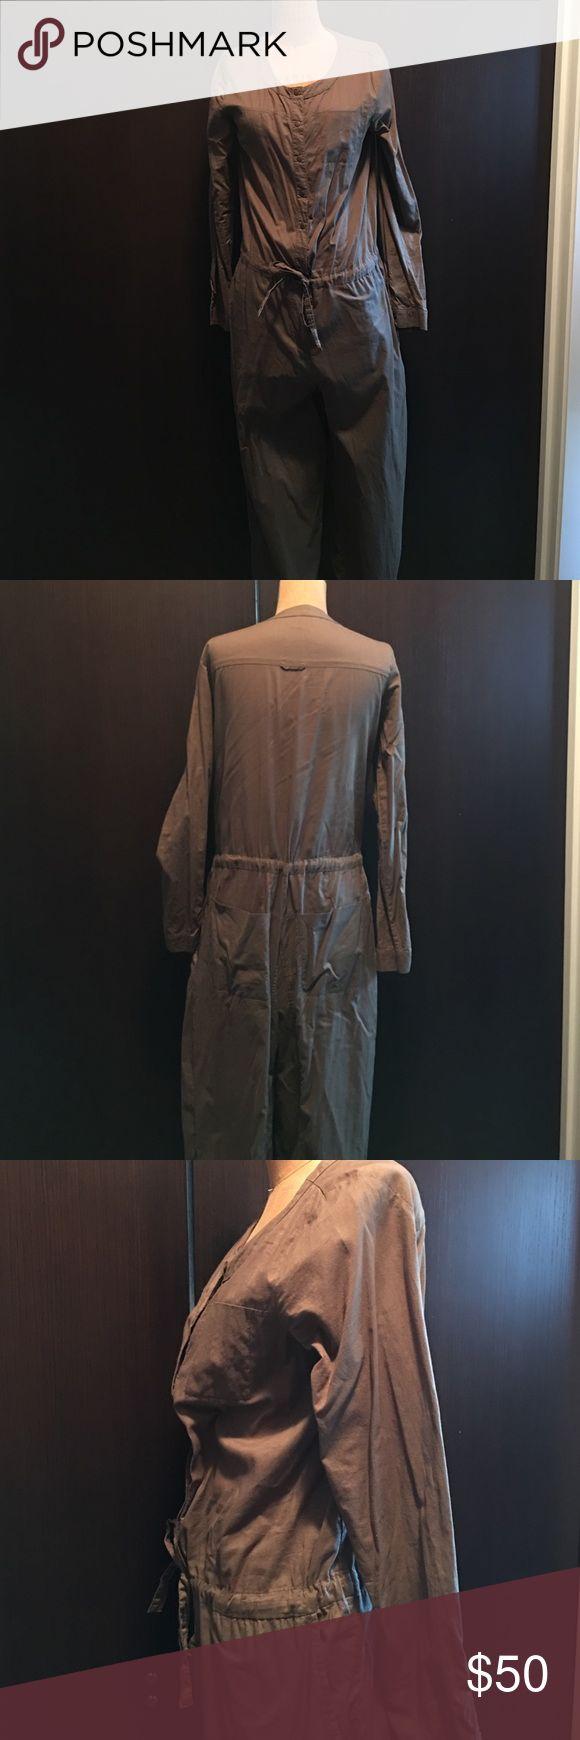 Jumpsuit Khaki one-piece jumpsuit with drawstring waist H&M Other